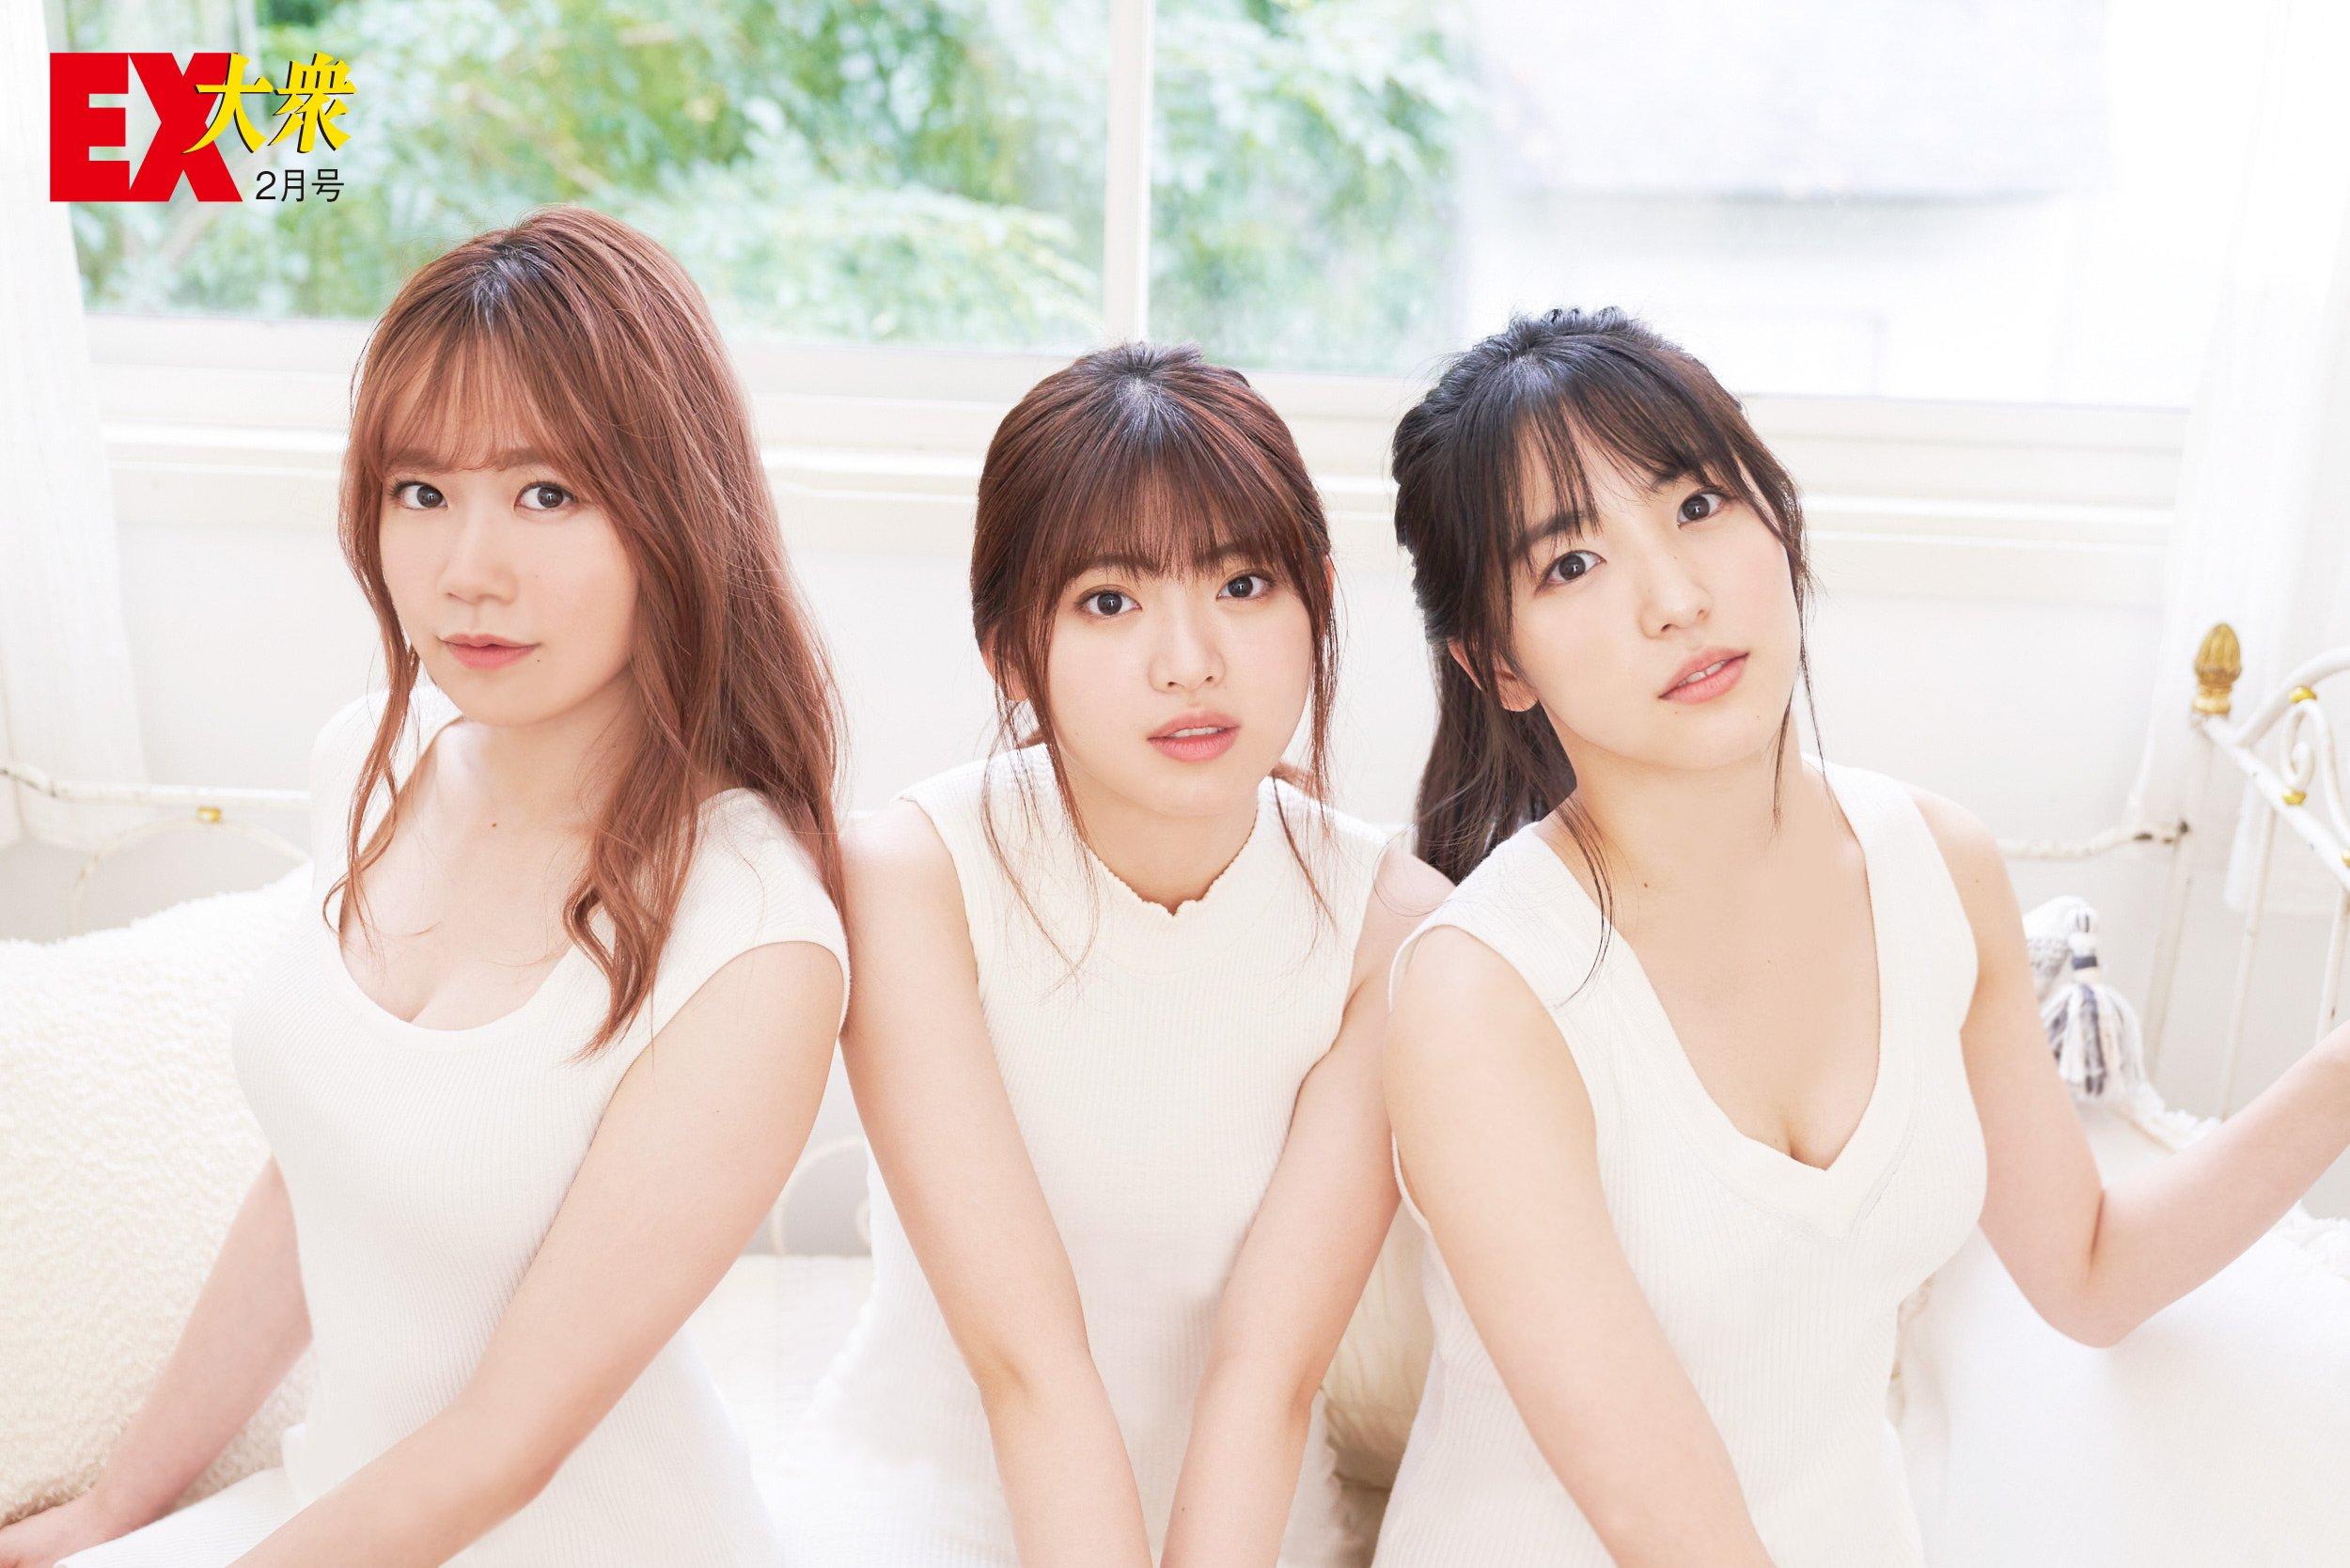 AKB48馬嘉伶、服部有菜、下尾みうの本誌未掲載カット7枚を大公開!【EX大衆2月号】の画像004